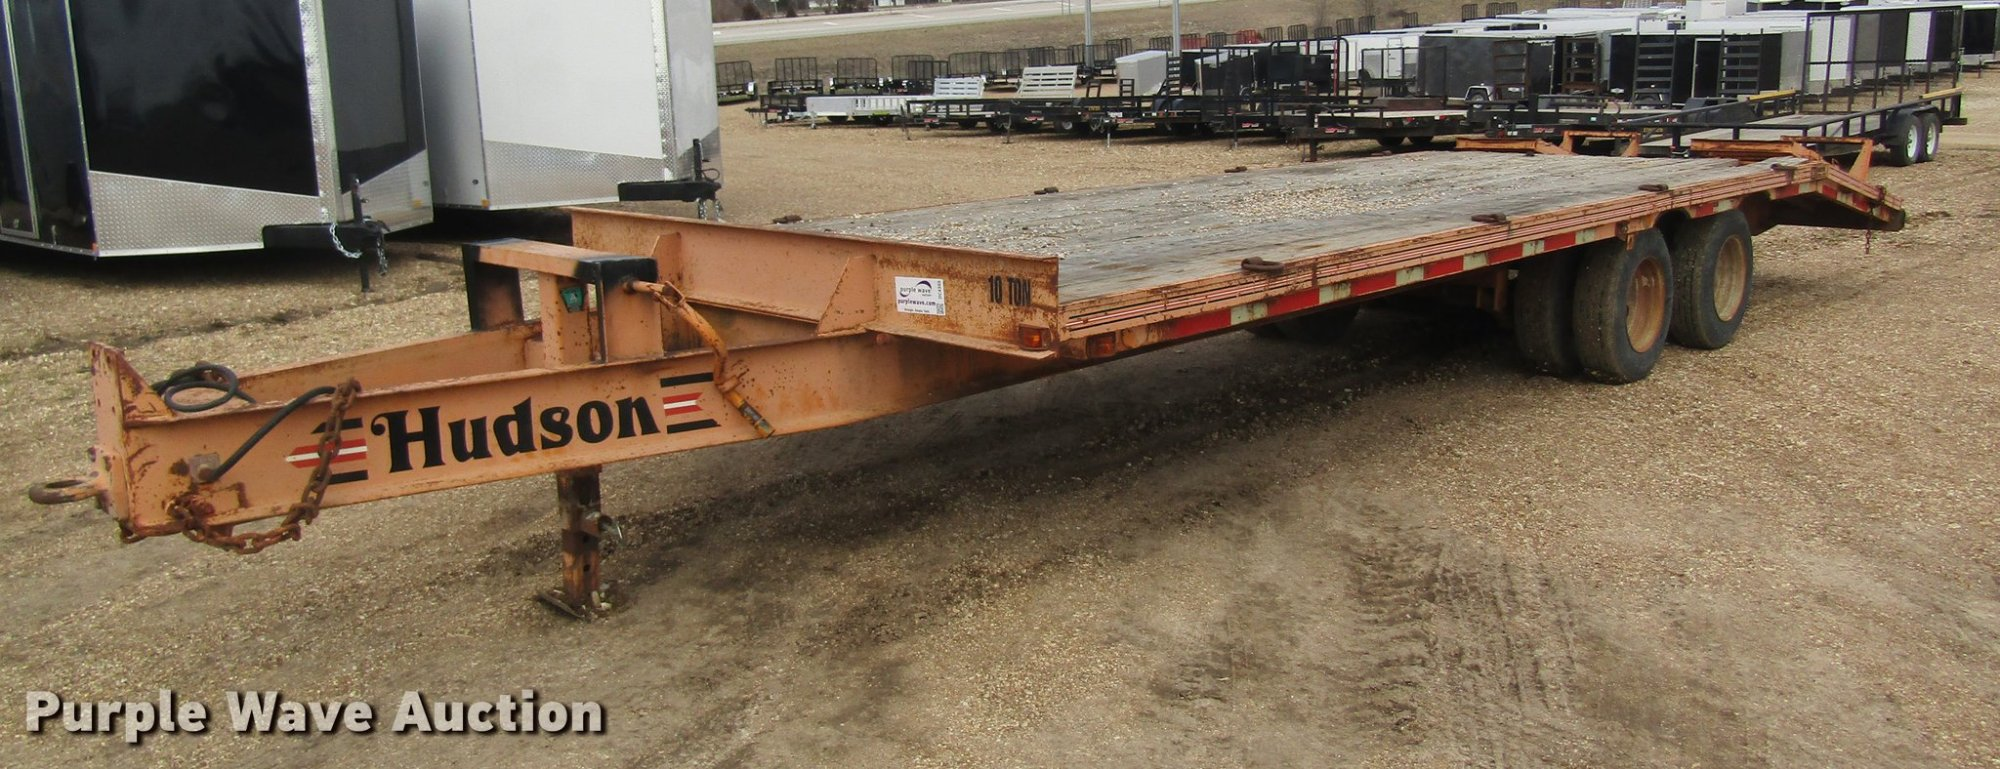 hight resolution of dc4365 image for item dc4365 1999 hudson equipment trailer